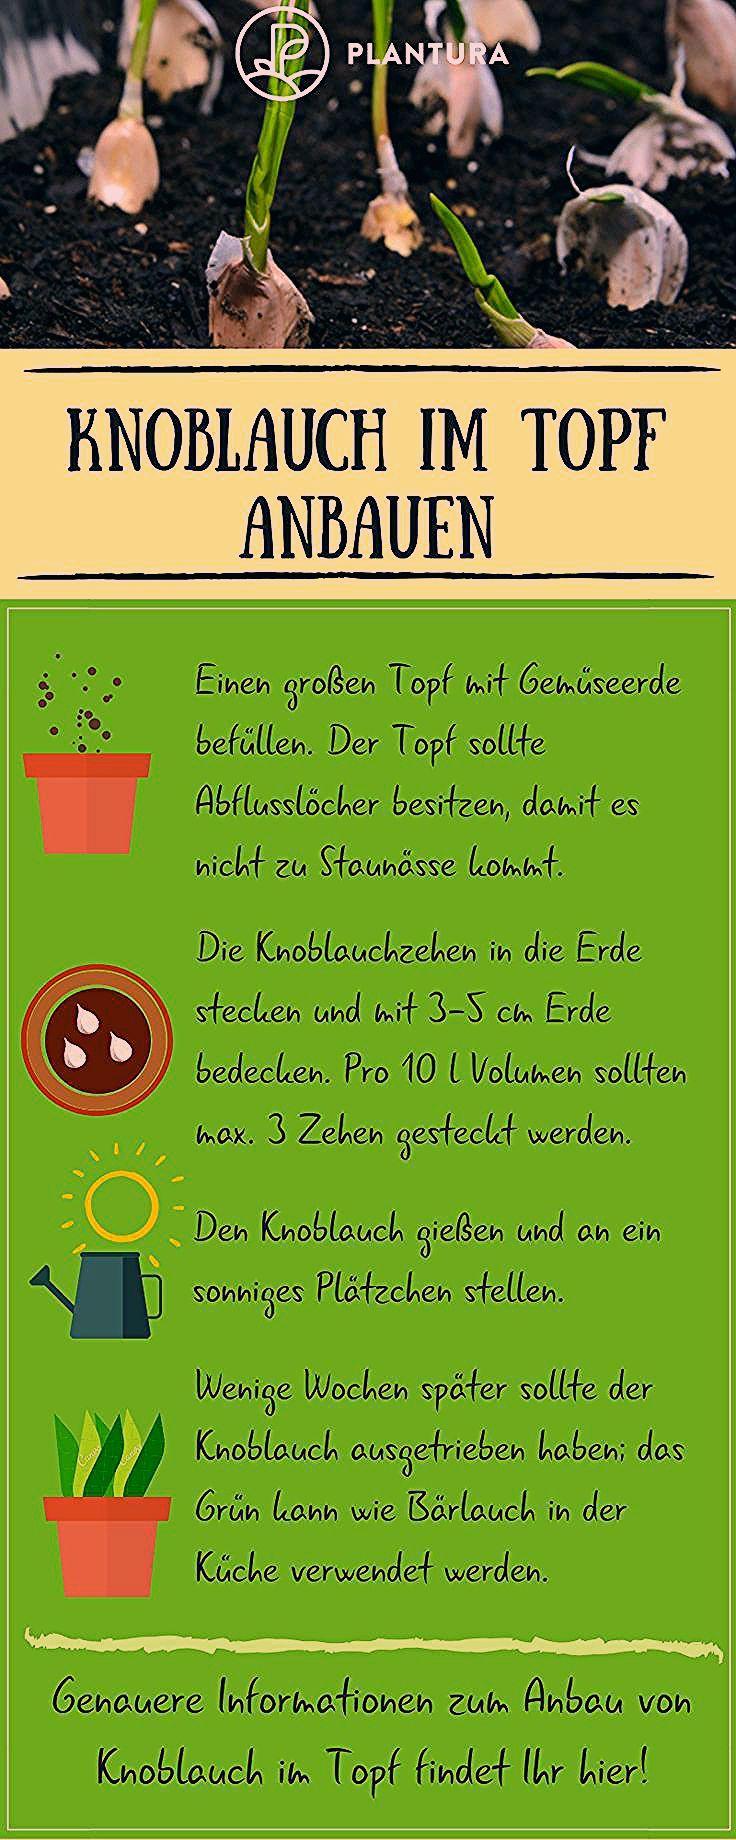 Knoblauch im Topf anbauen: Video & Anleitung - Plantura